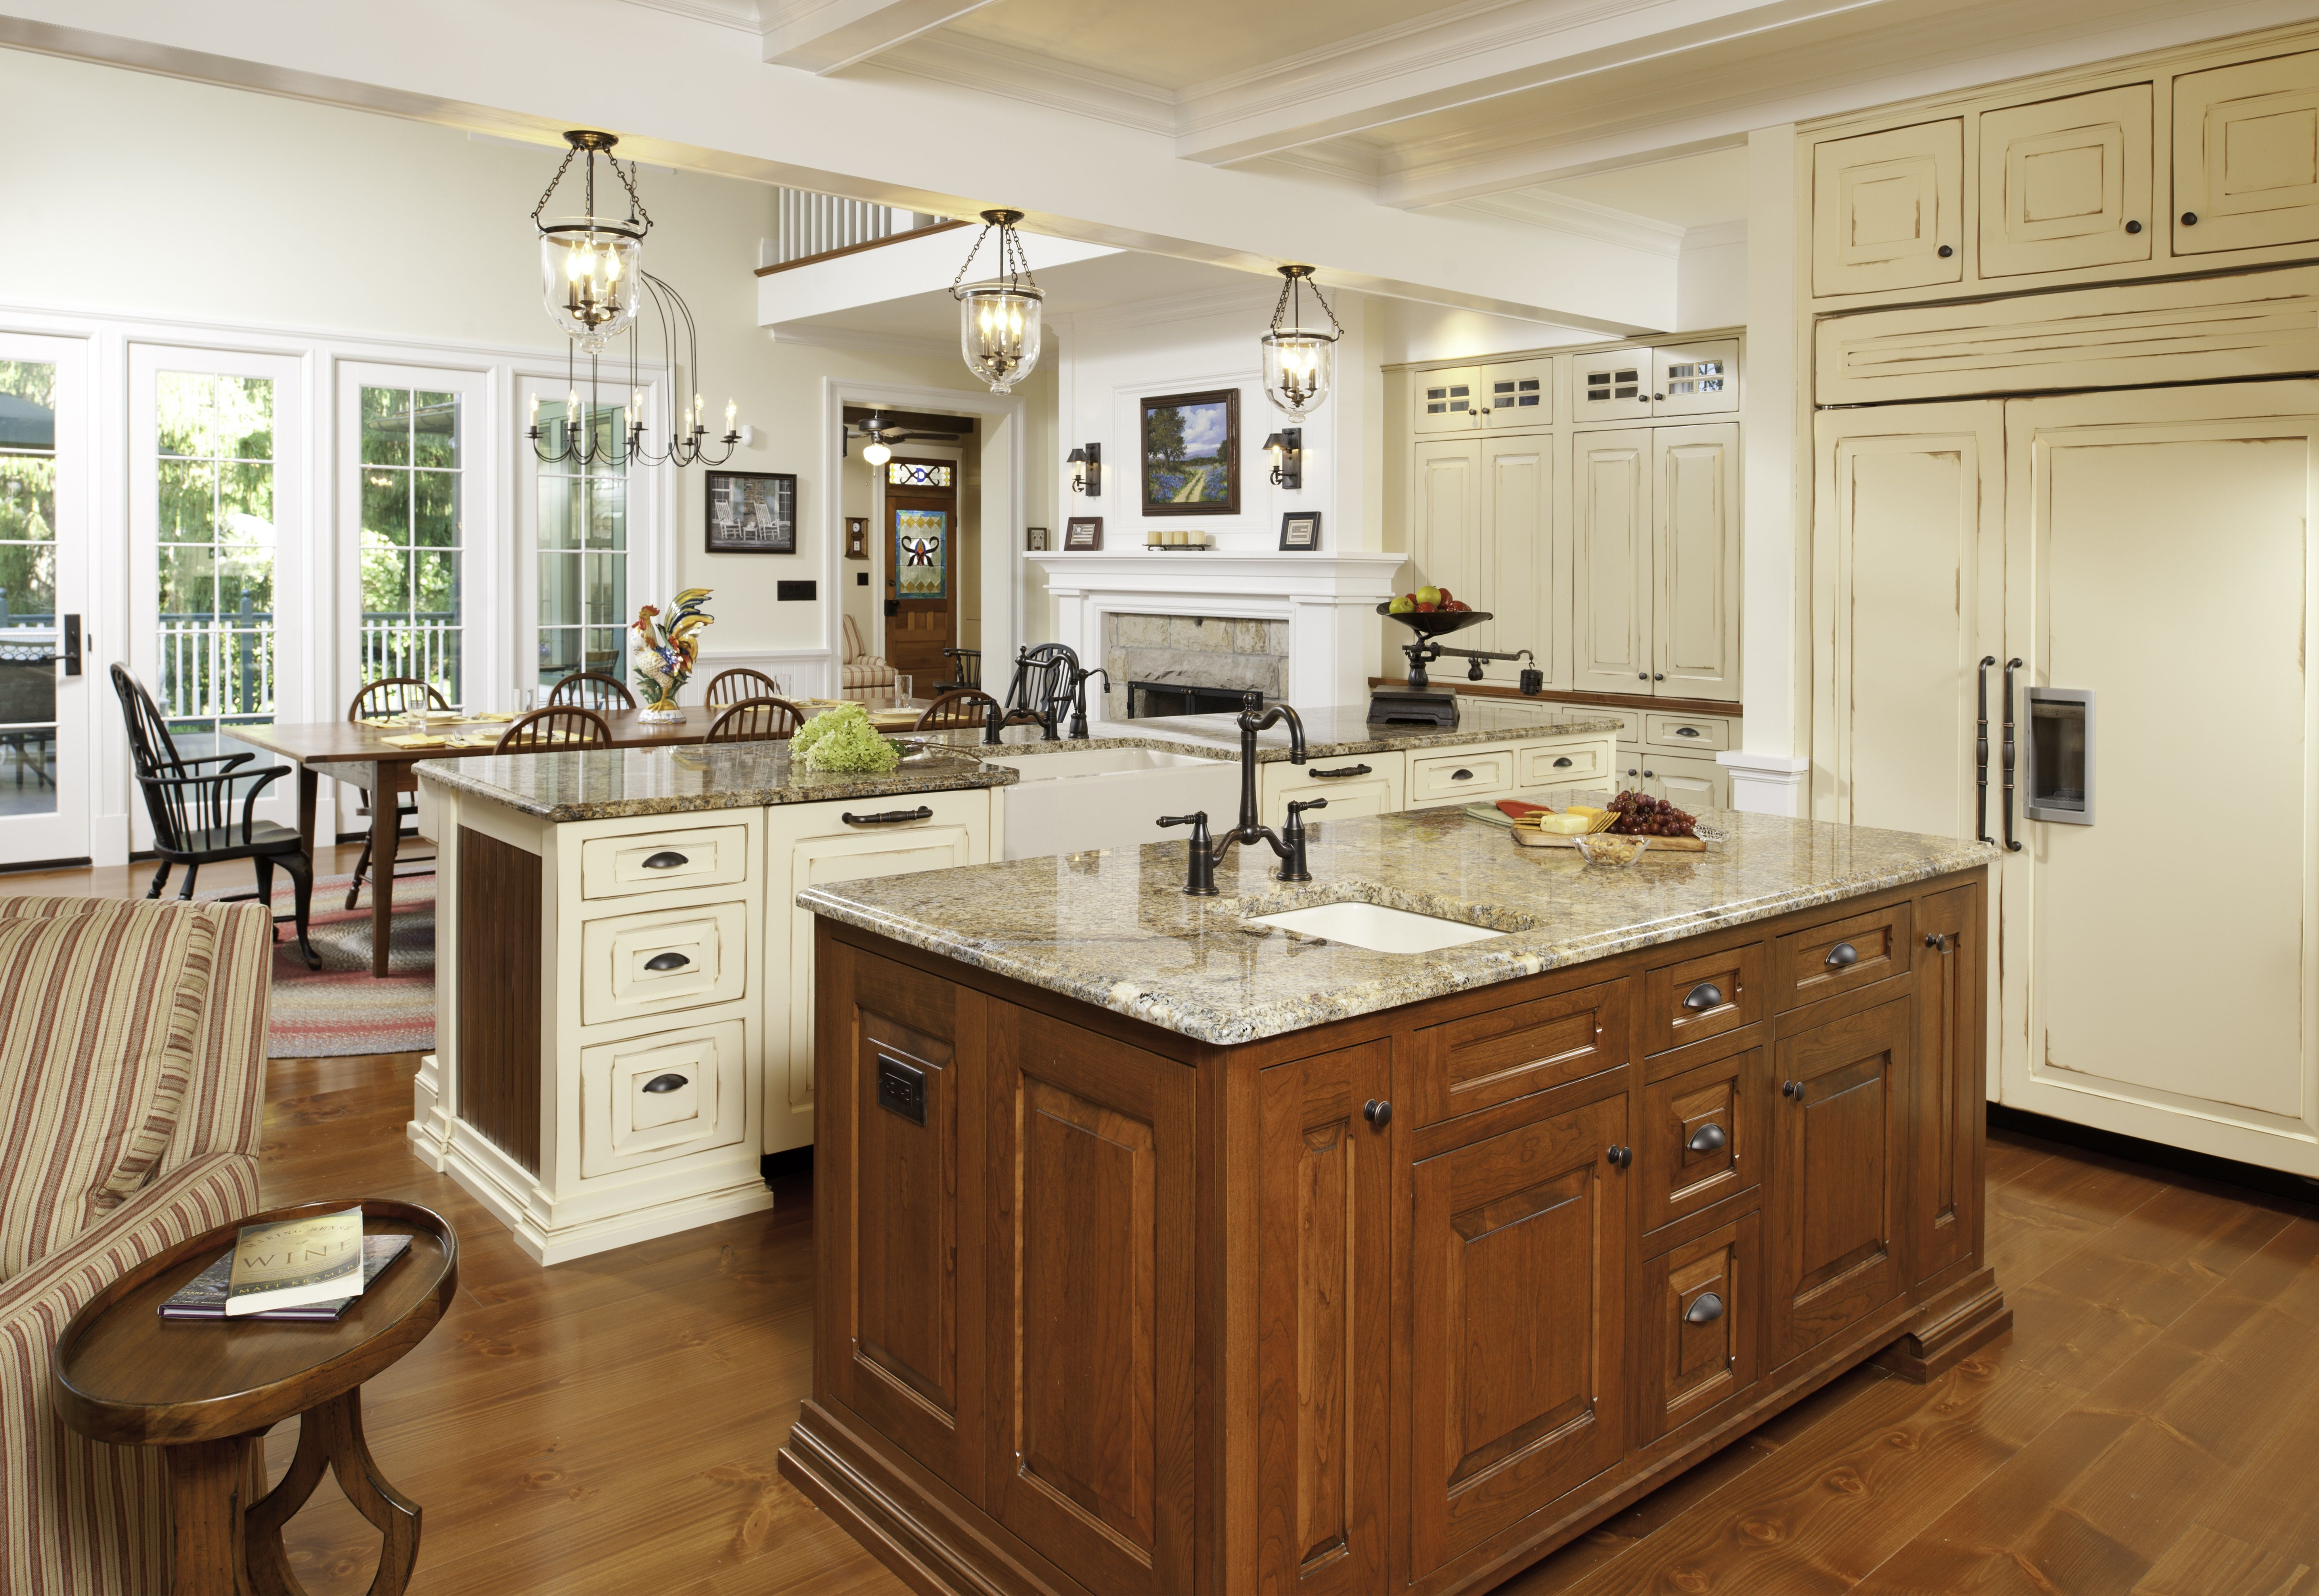 Exceptional Magnificent Kitchens | Magnificent Custom Kitchen | Kitchens/Pantries/Nooksu2026